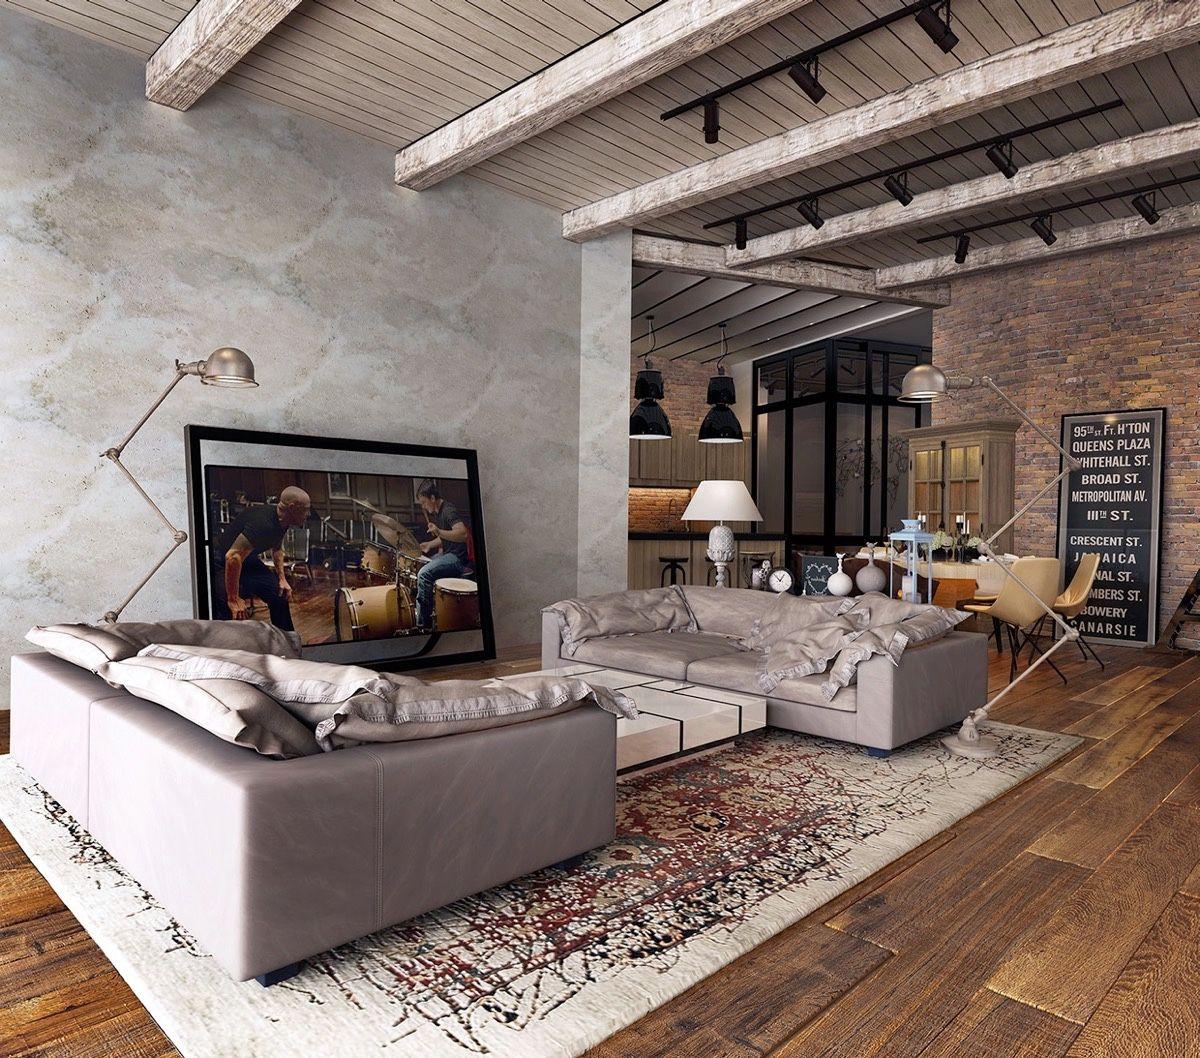 Interior Beams Rustic Ambiance